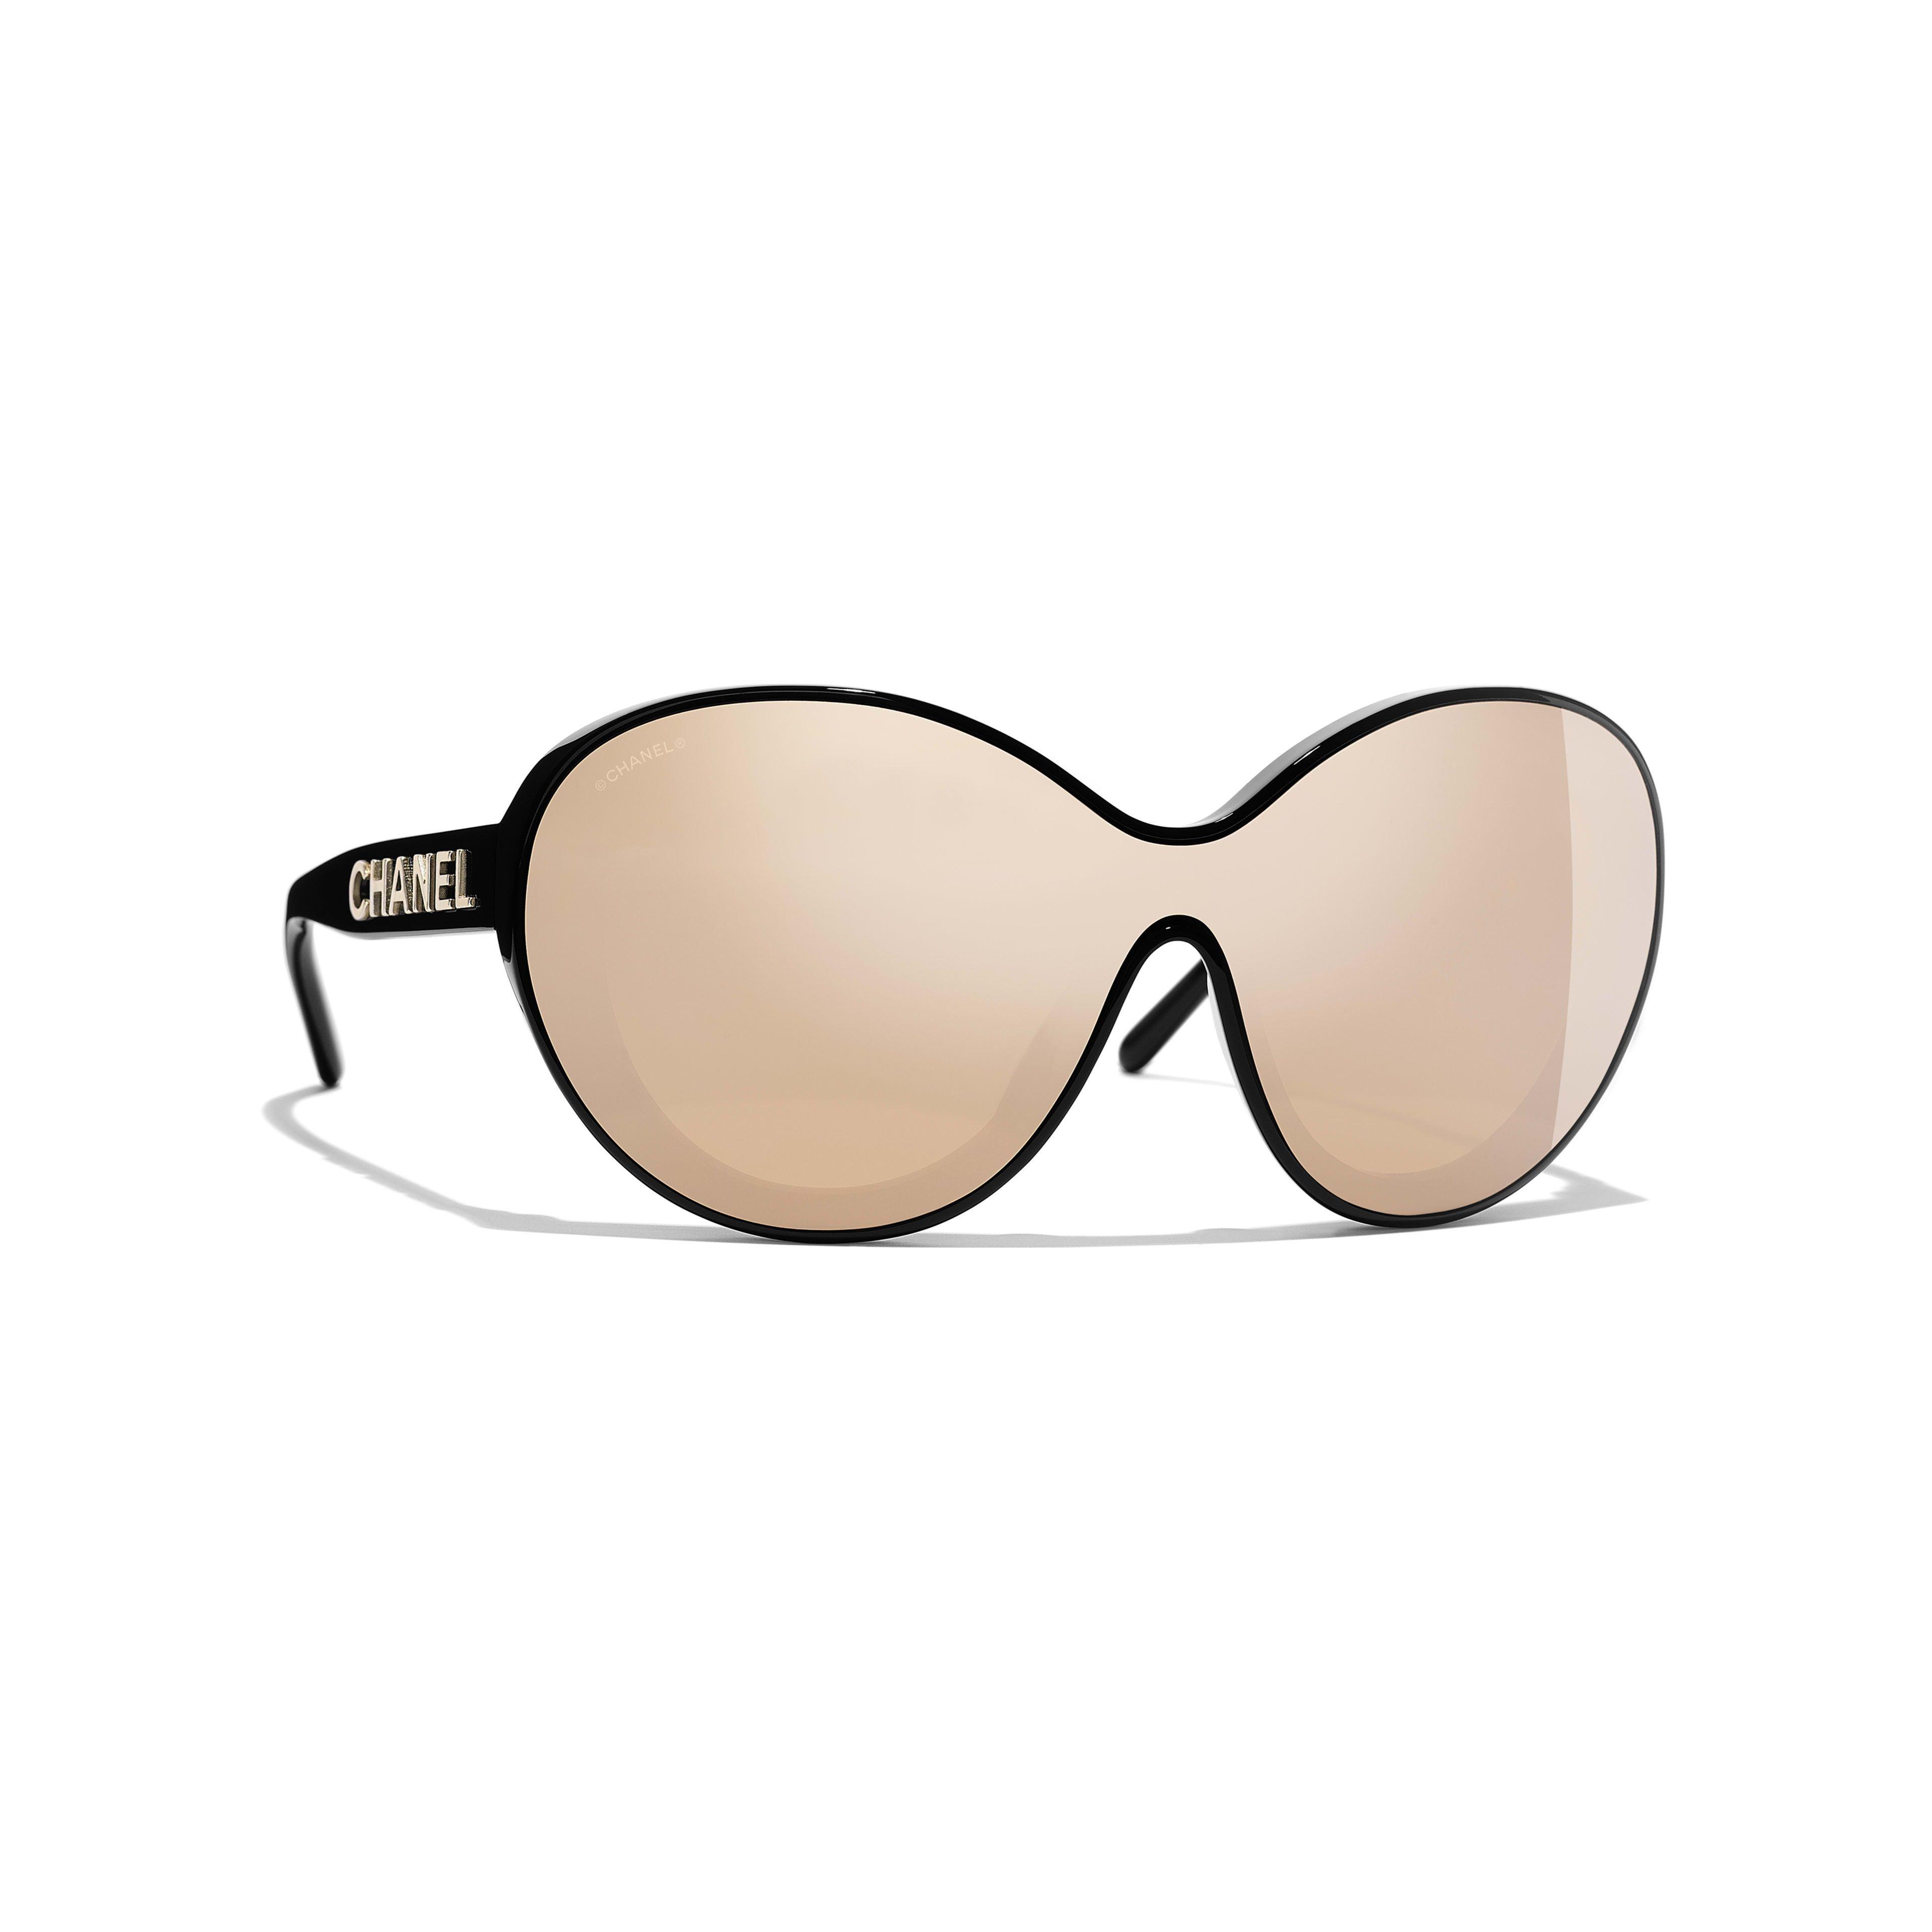 2eca0432e9 Shield Sunglasses Black frame. 24-Karat Gold lenses. Ref.1038 C622 ...